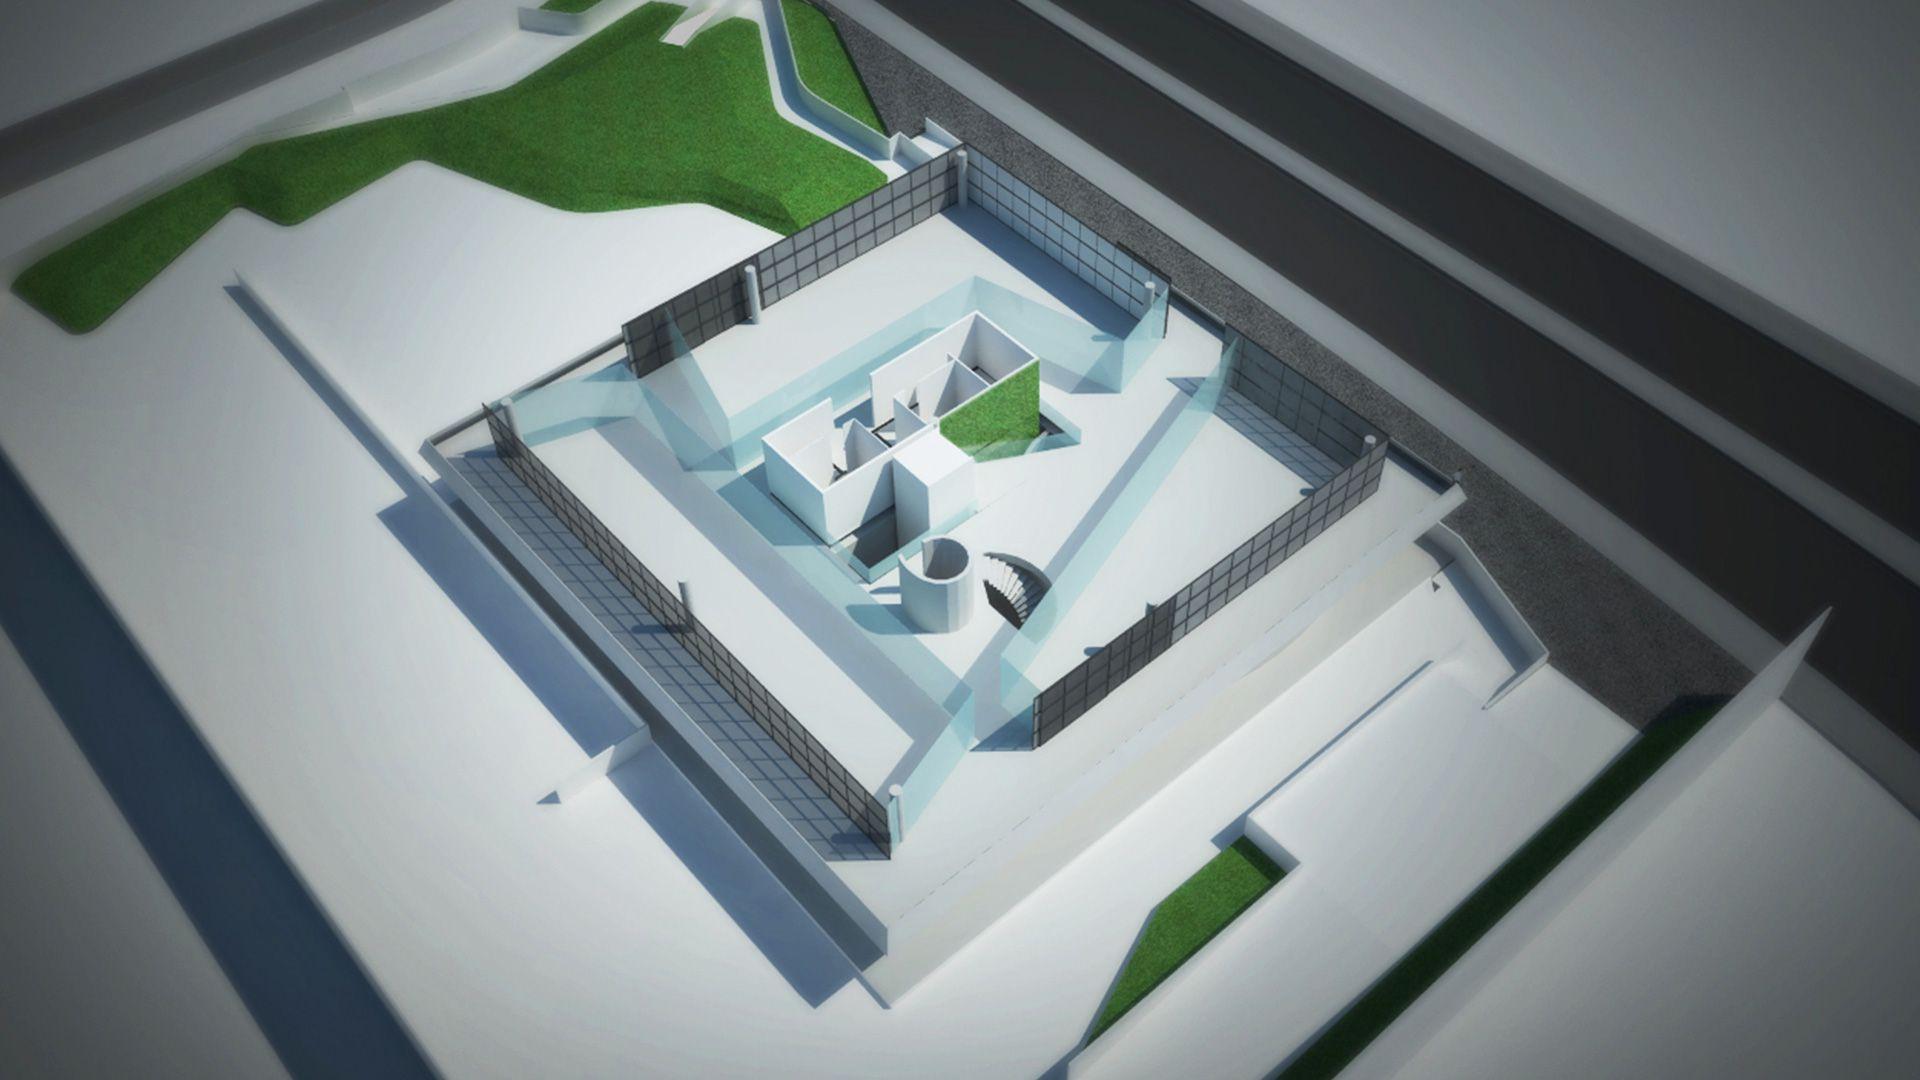 midiateca-santo-andre-render-layout-1-pavimento-proposta